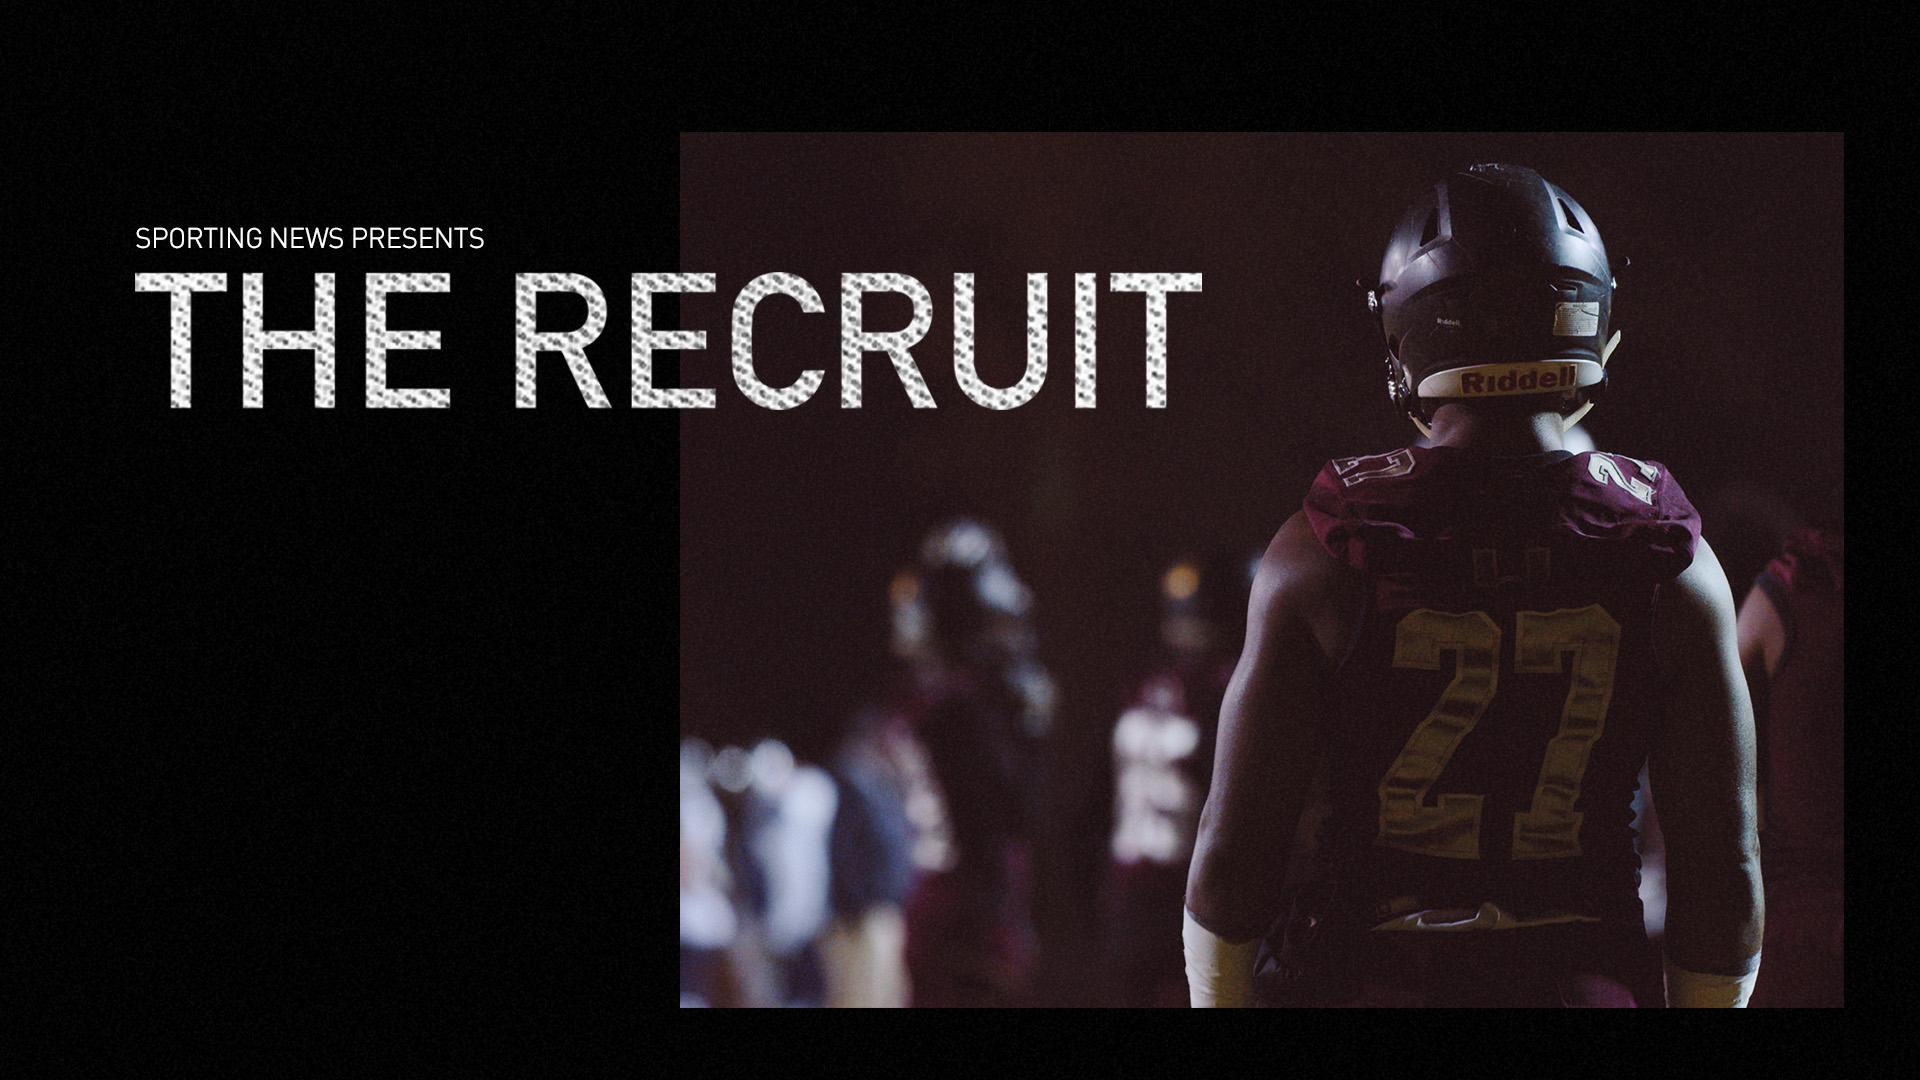 The-recruit-ftr_1klr4476saynt1p5p8x7o05py0